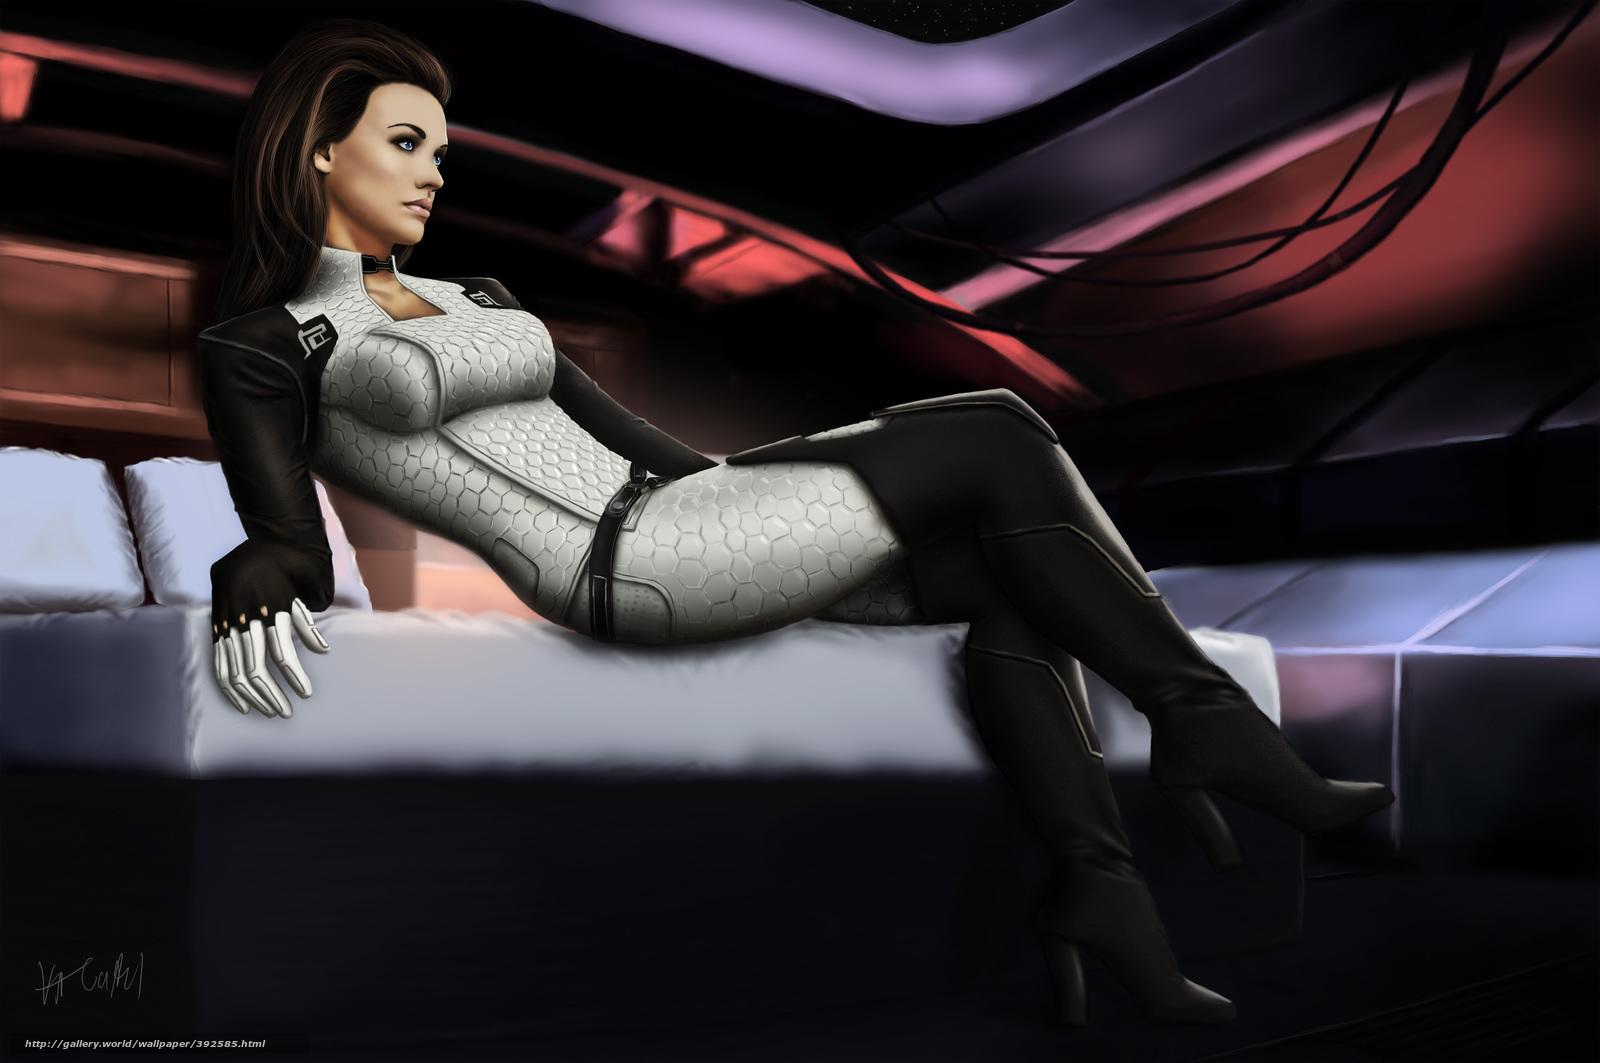 mamku-zhopu-seksualnie-kartinki-devushek-iz-kompyuternih-igr-foto-sasha-grey